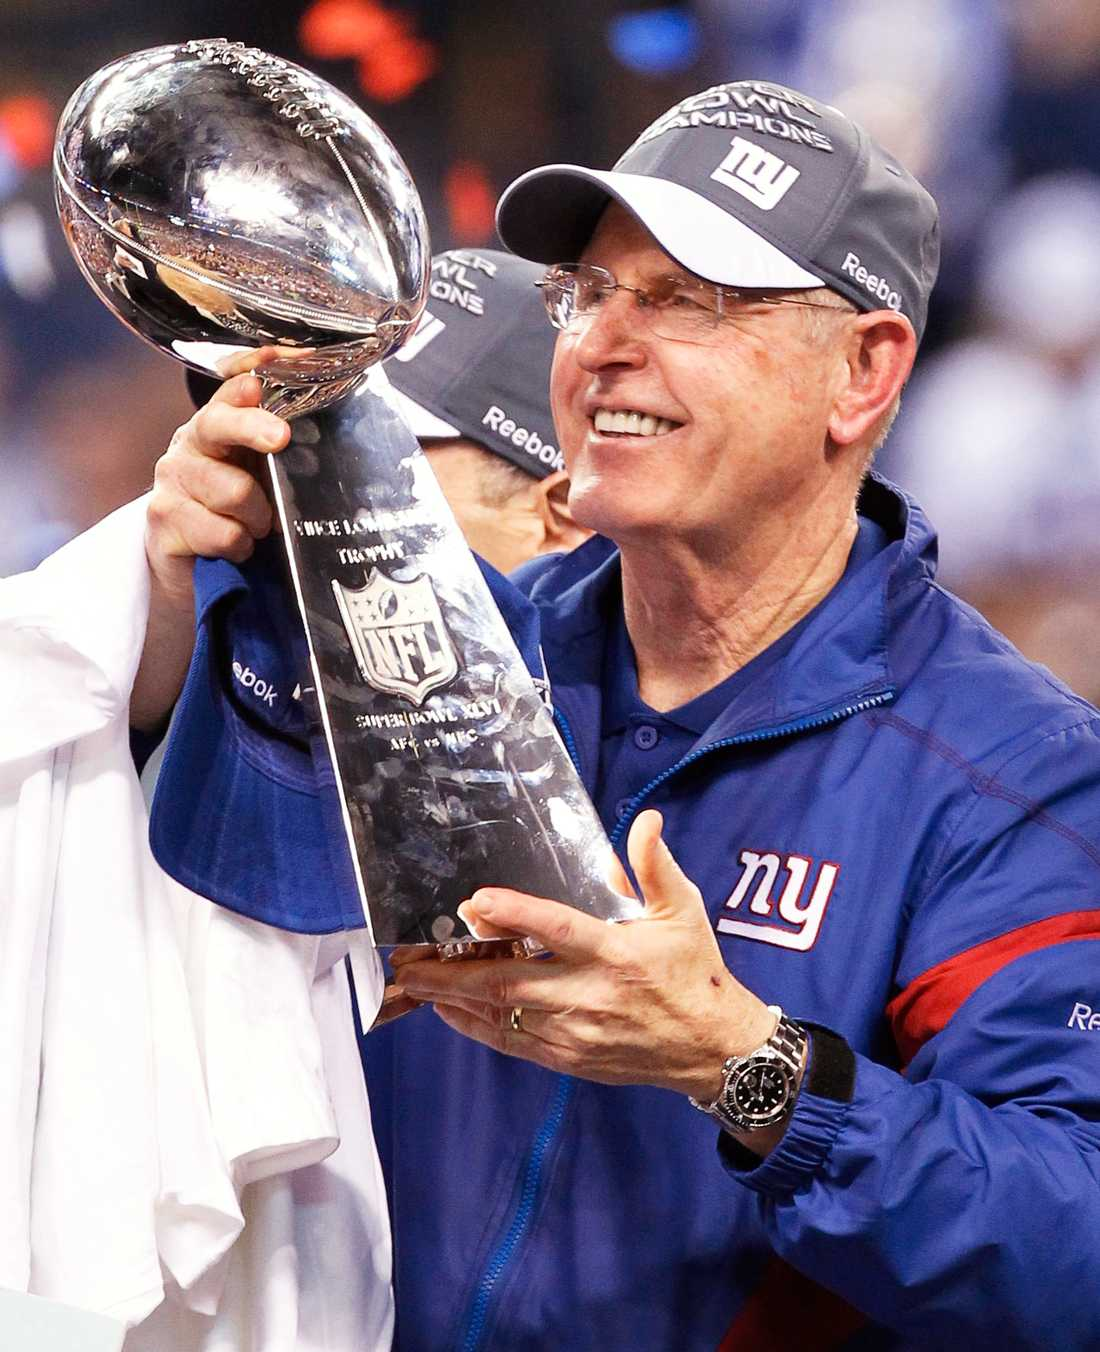 Giants coach Tom Coughlin med Vince Lombardi Trophy.